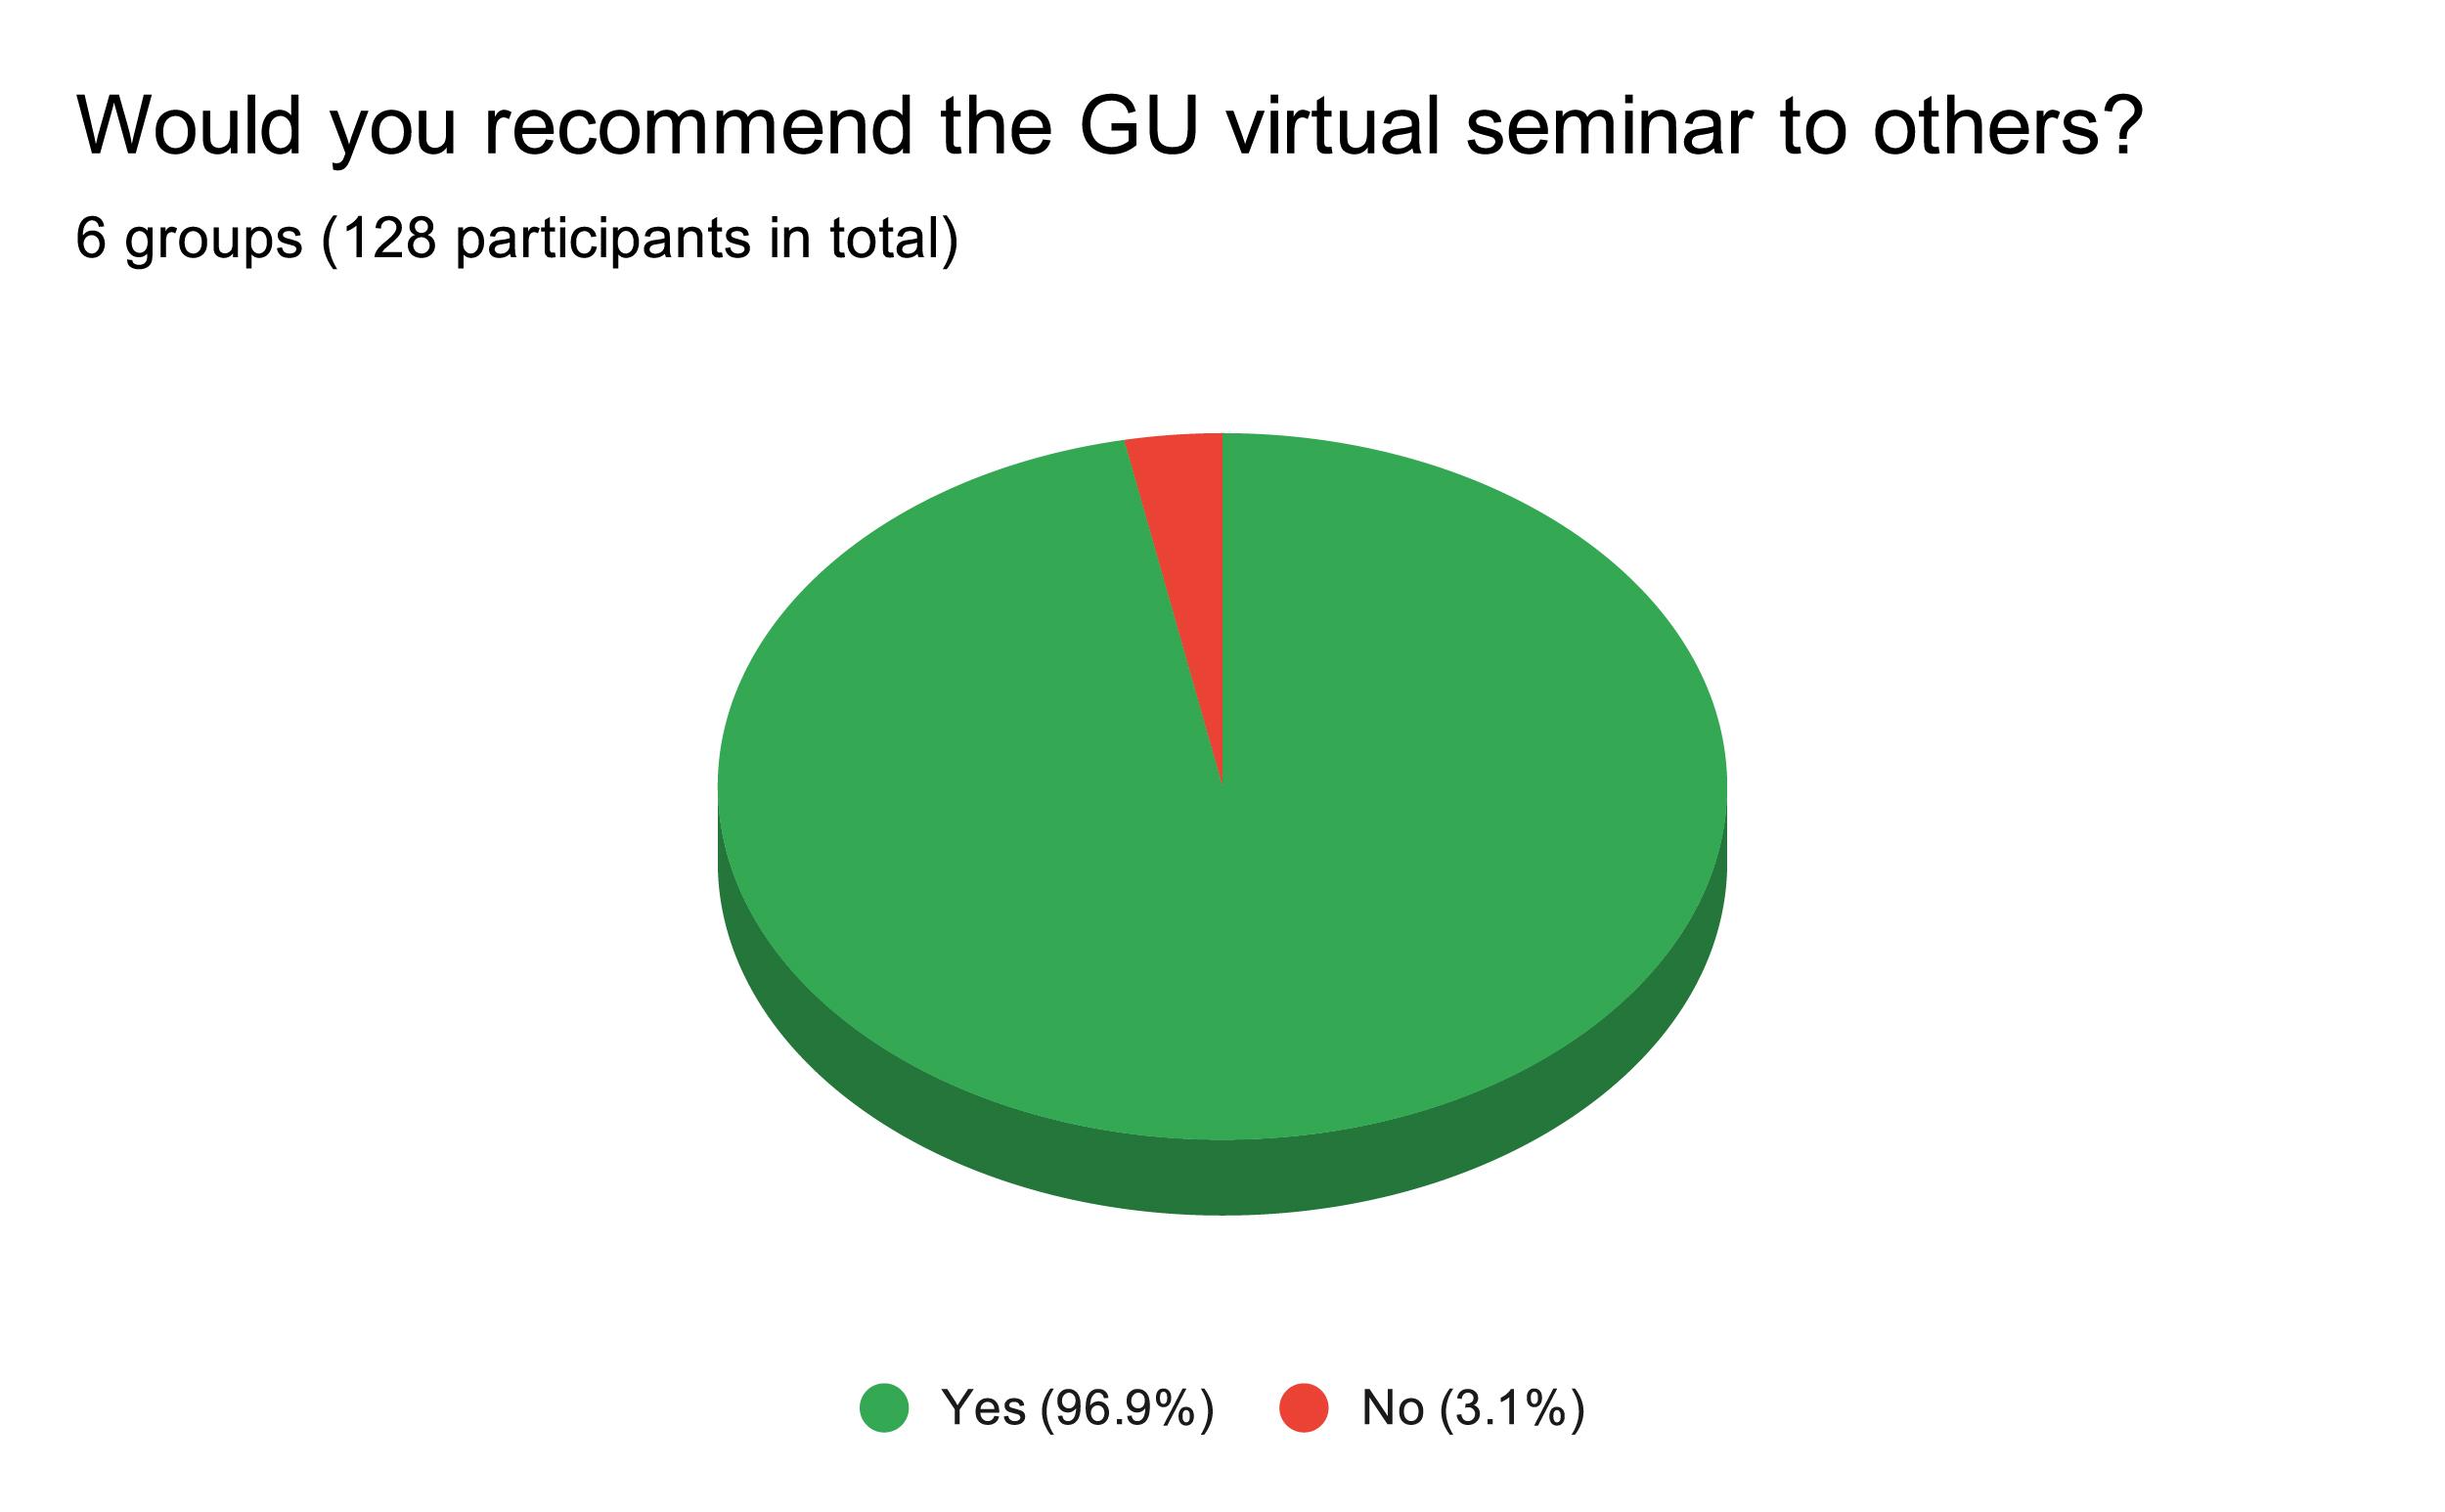 séminaire virtuel GU 7